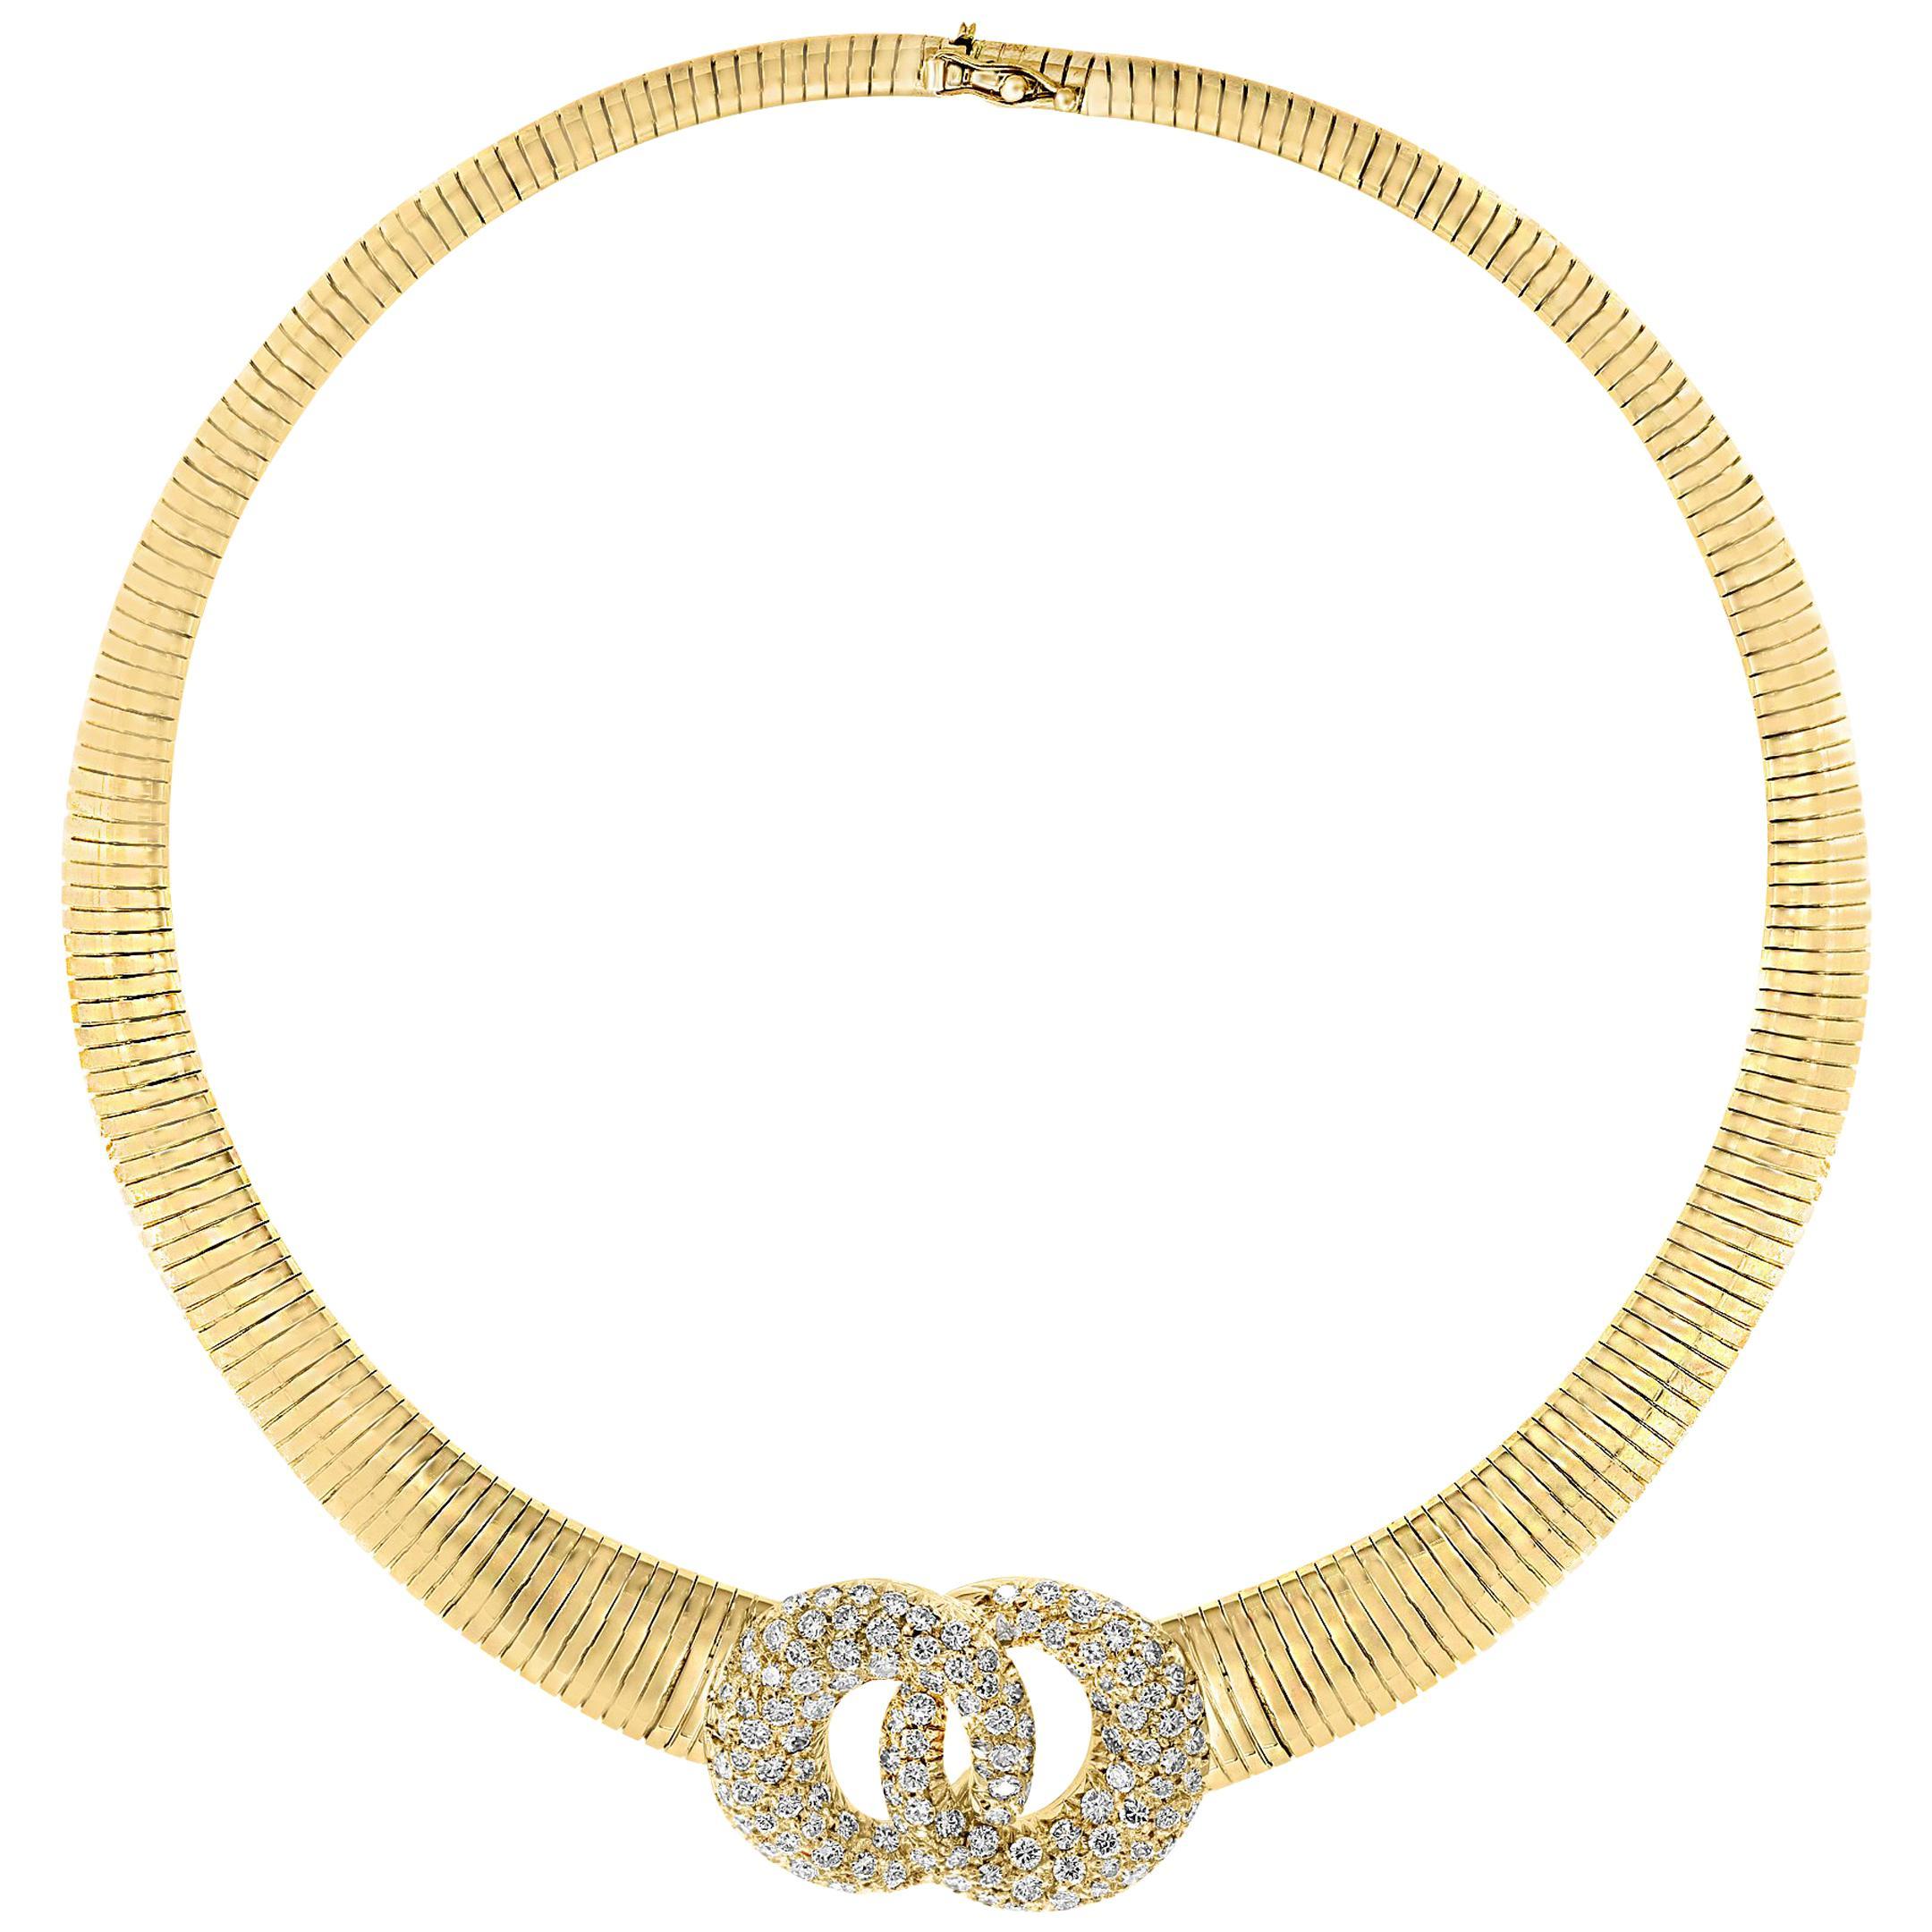 Van Cleef & Arpels 18 Carat Yellow Gold and  6 Ct Diamond Collar/Choker Necklace